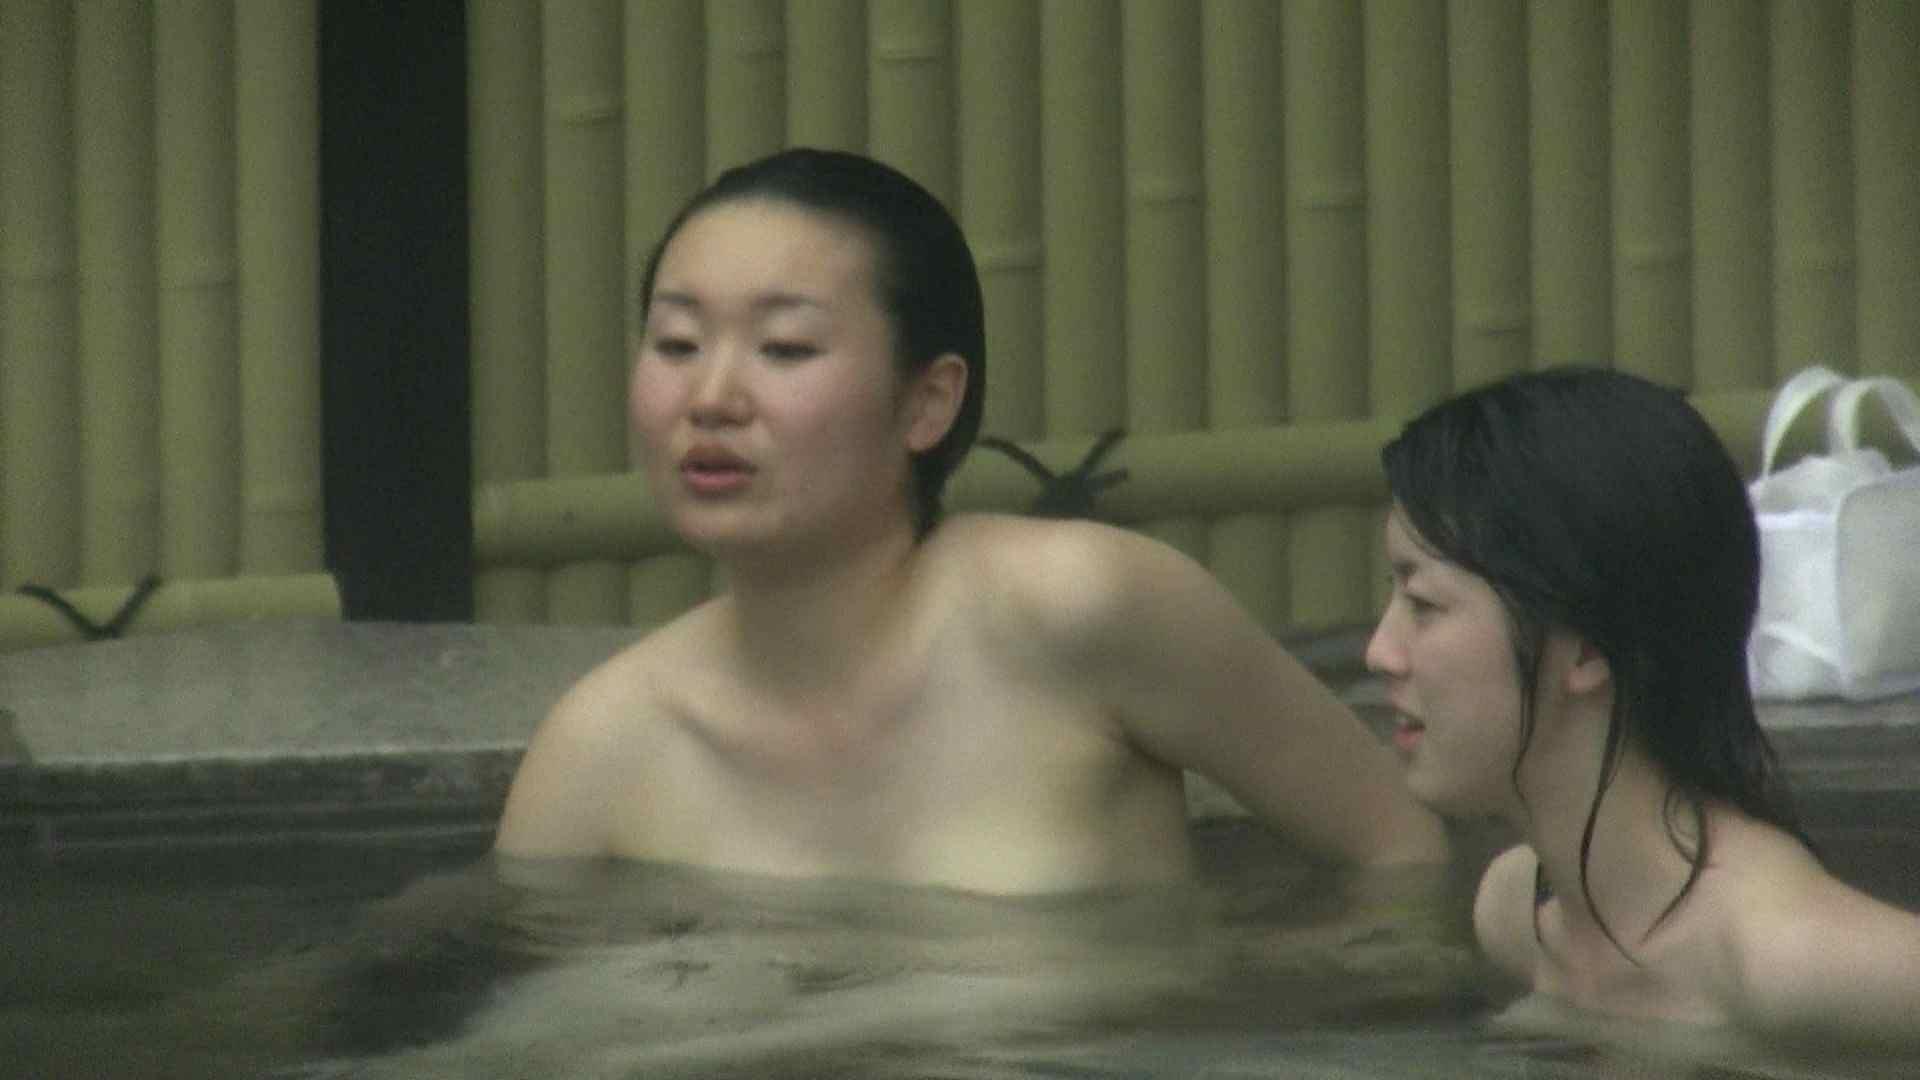 Aquaな露天風呂Vol.171 OLエロ画像 盗撮戯れ無修正画像 108PICs 32